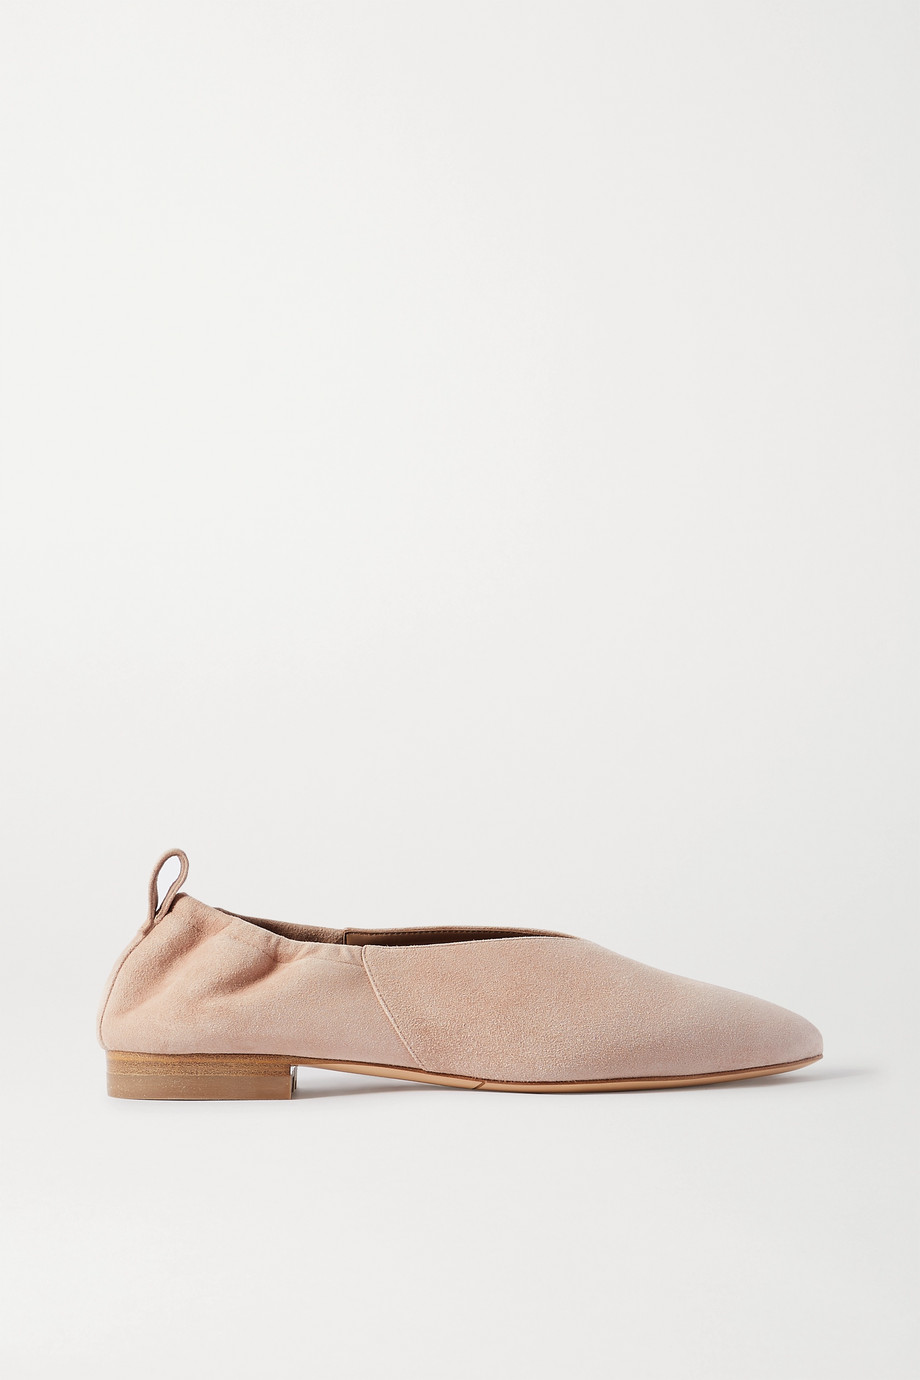 Co Suede ballet flats